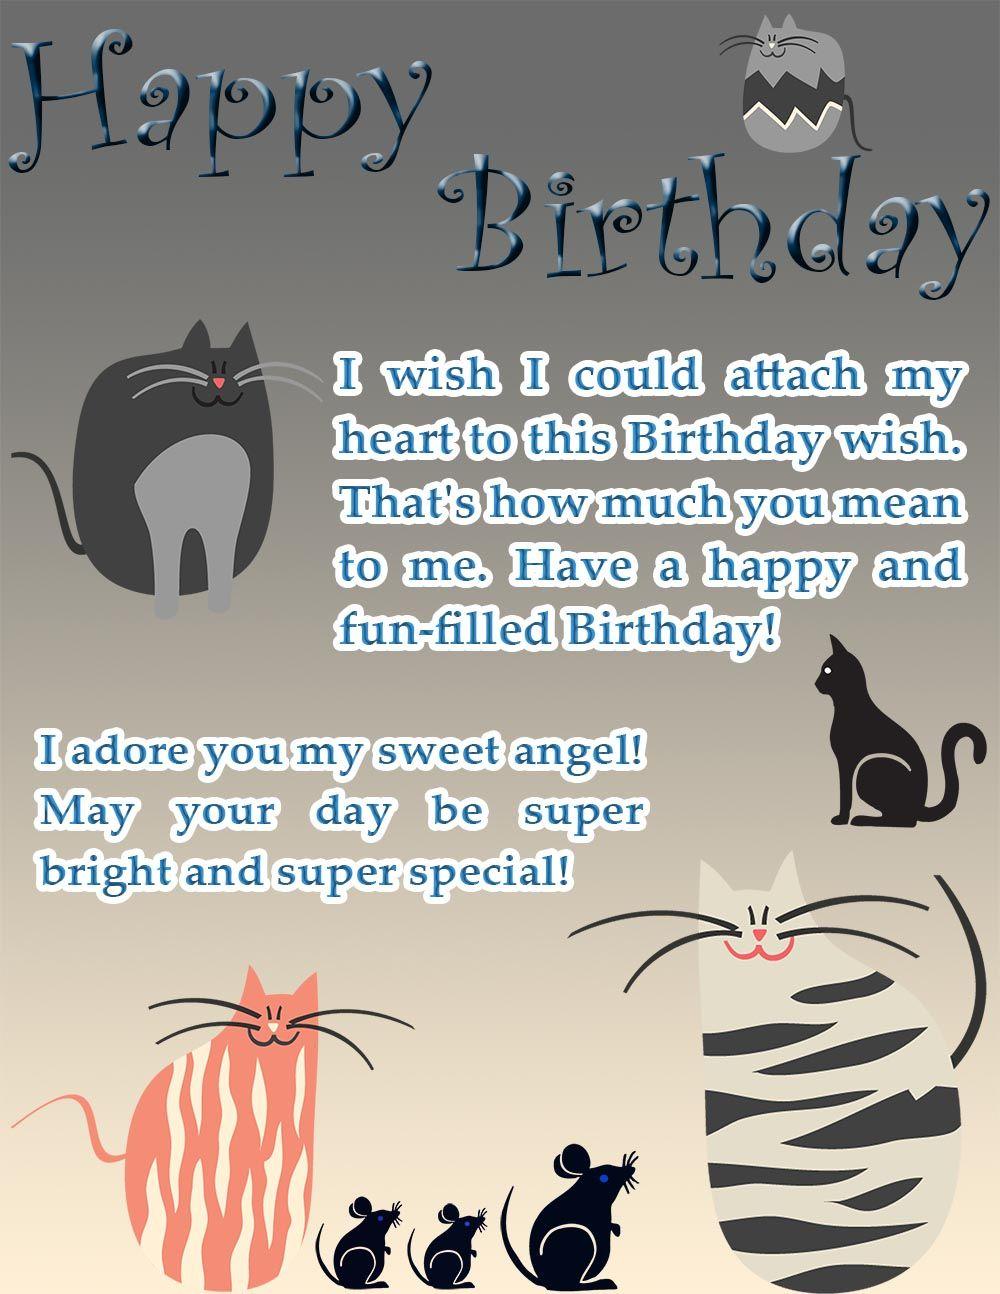 Happy birthday ecard wordsmiths really pinterest happy happy birthday ecard happy birthday ecardbirthday quotesbirthday greetingsfriends familyecardsloved kristyandbryce Gallery